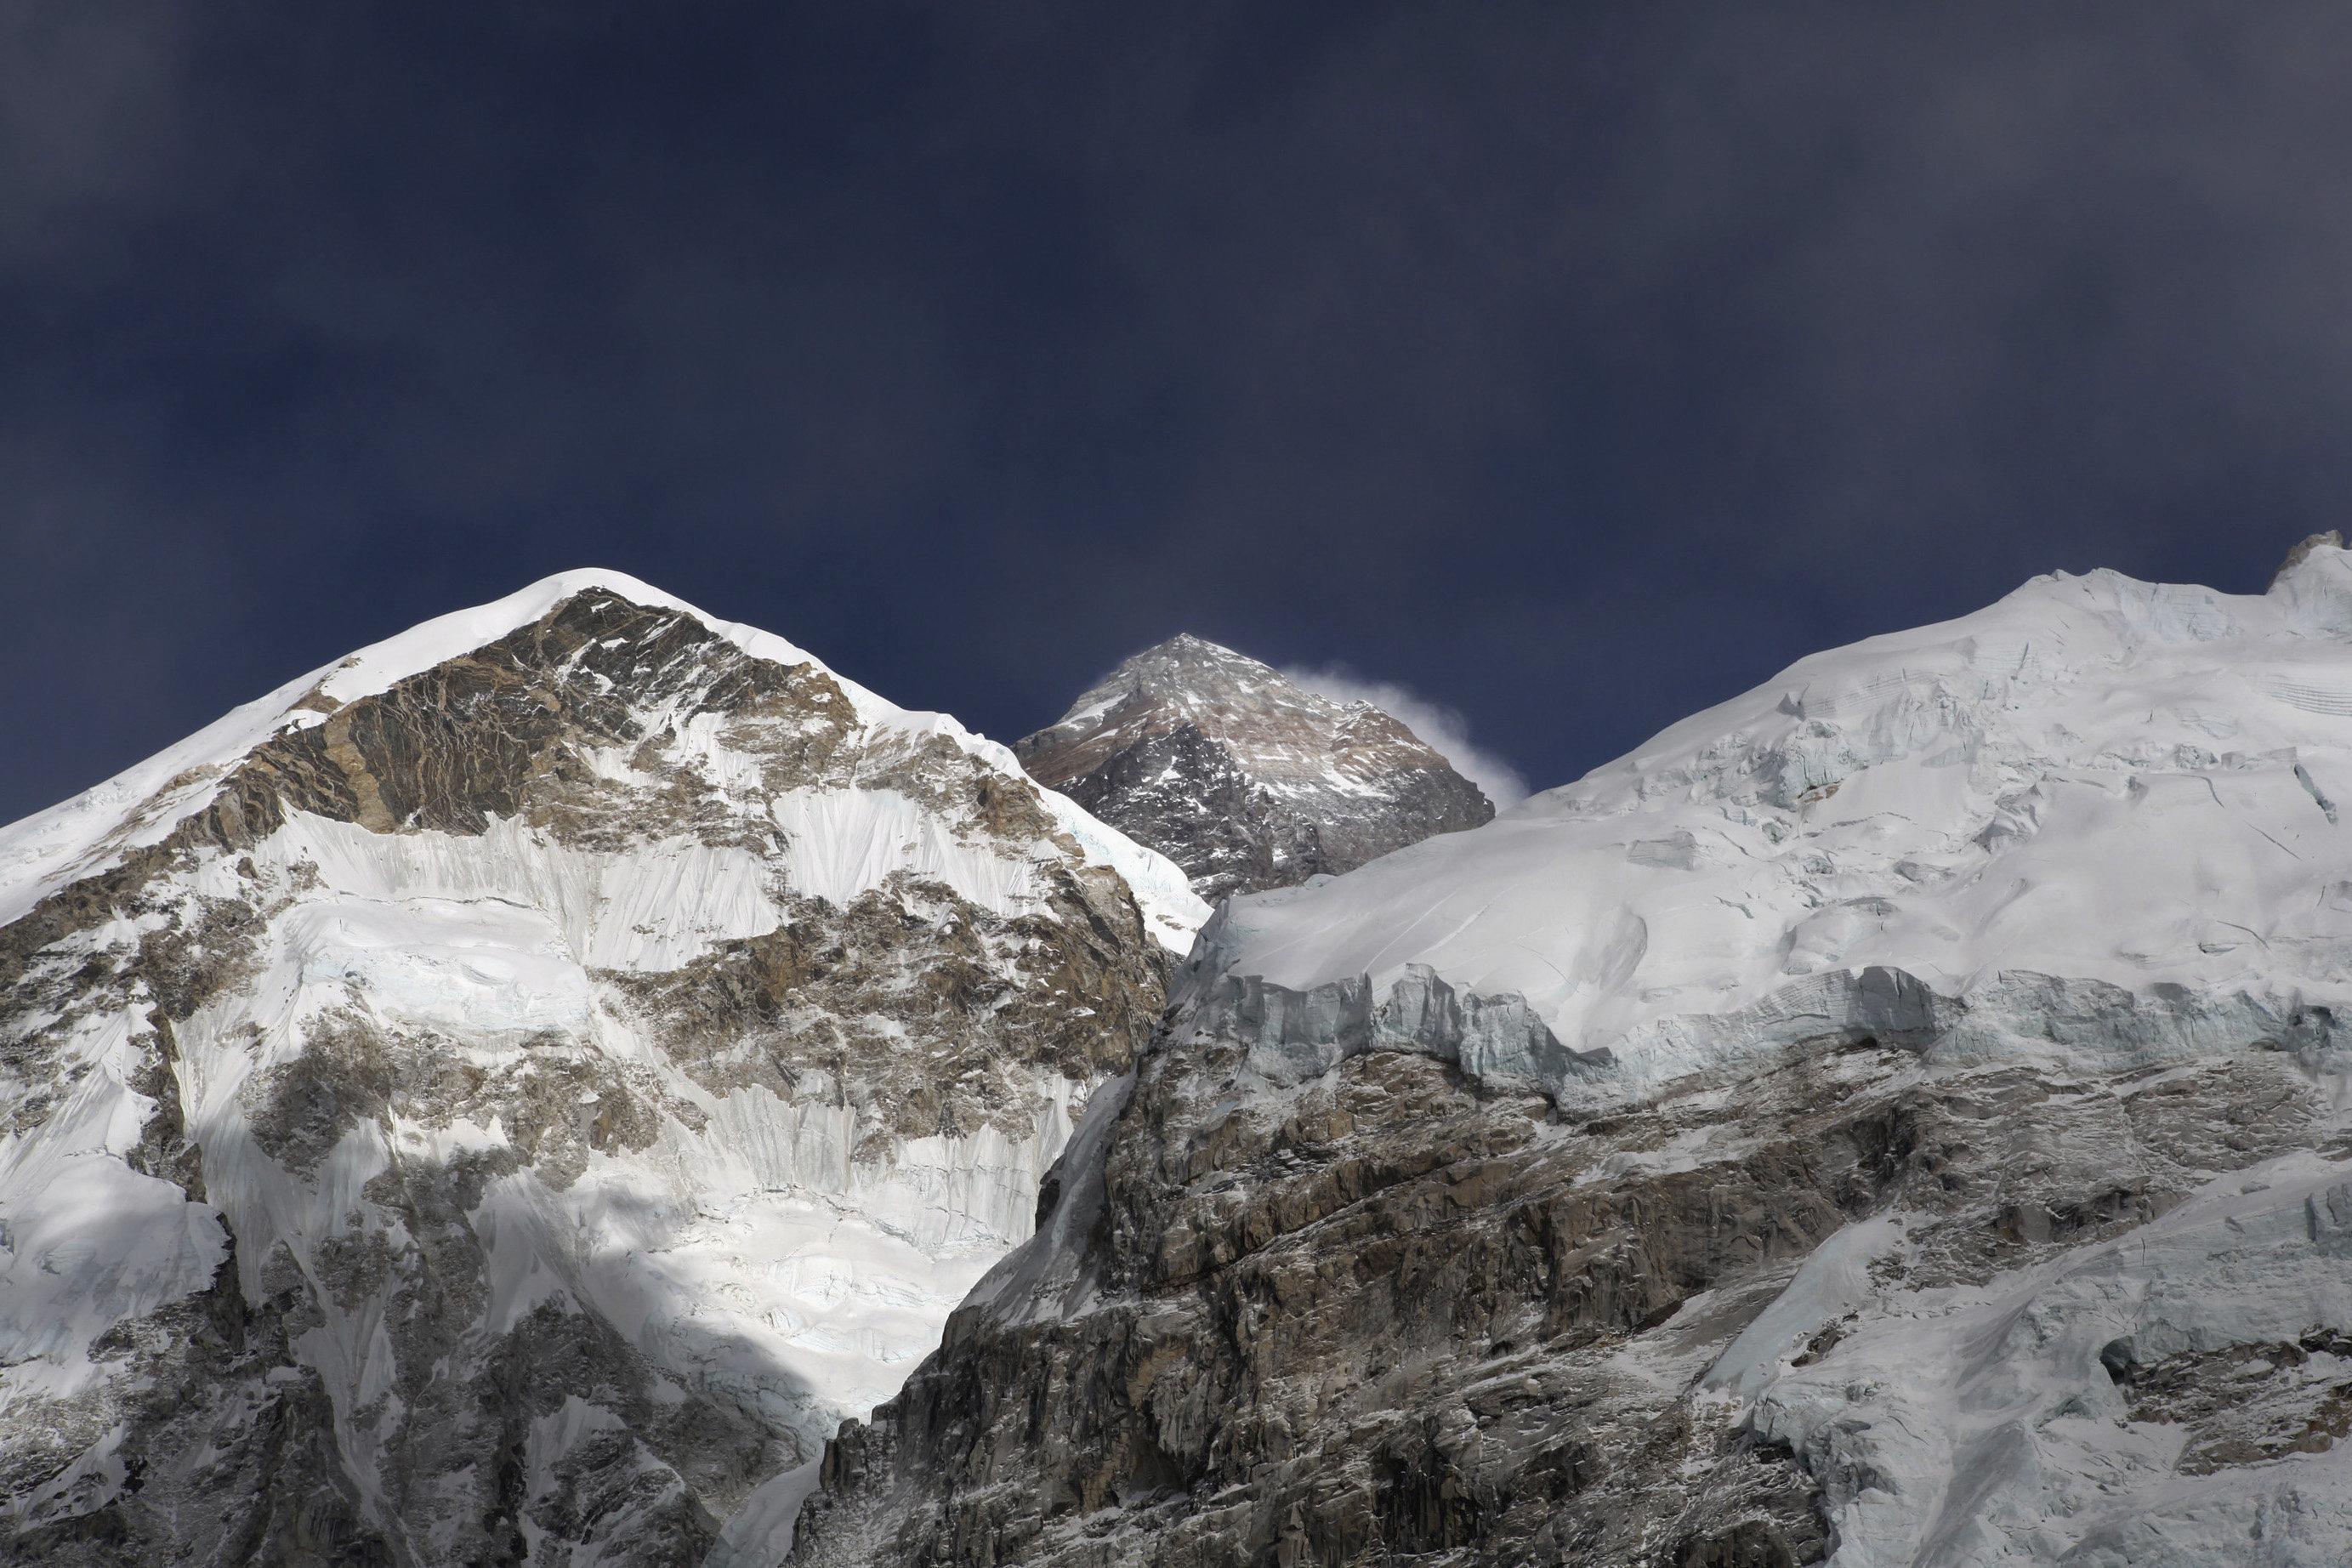 Mt. Everest (AP Photo/Tashi Sherpa, File)